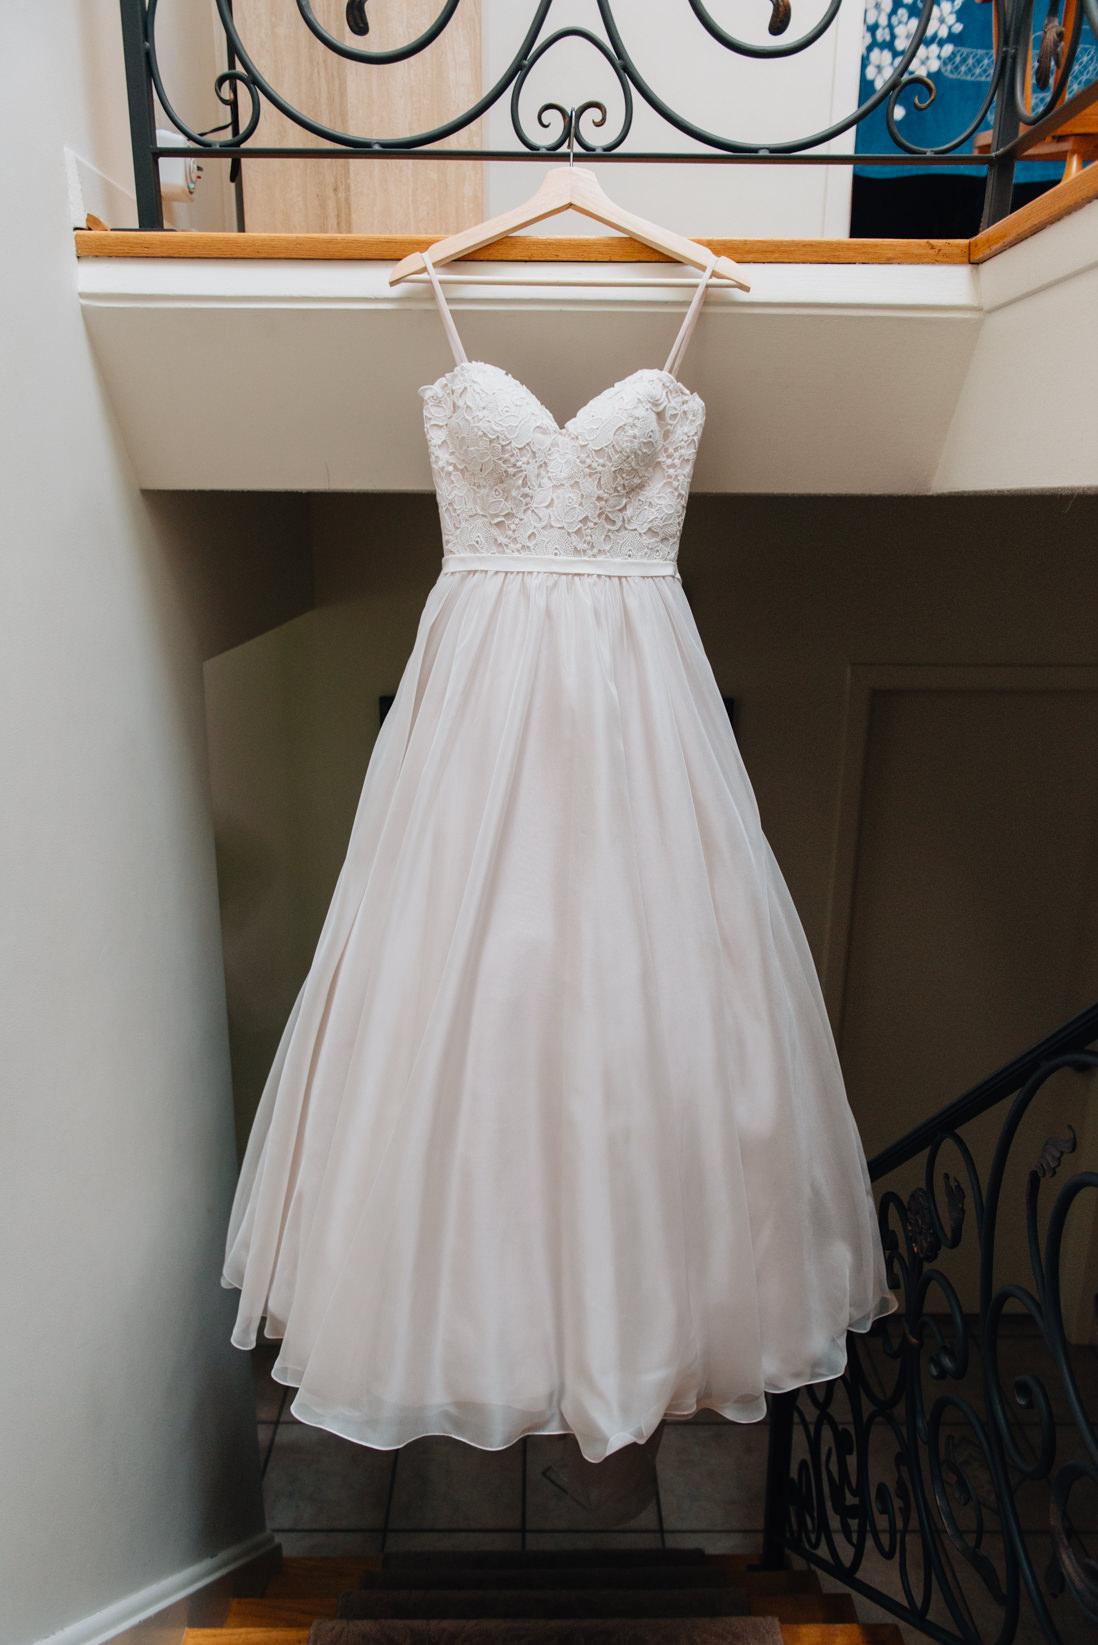 essense of australia wedding dress hanging in stairwell | eightyfifth street photography